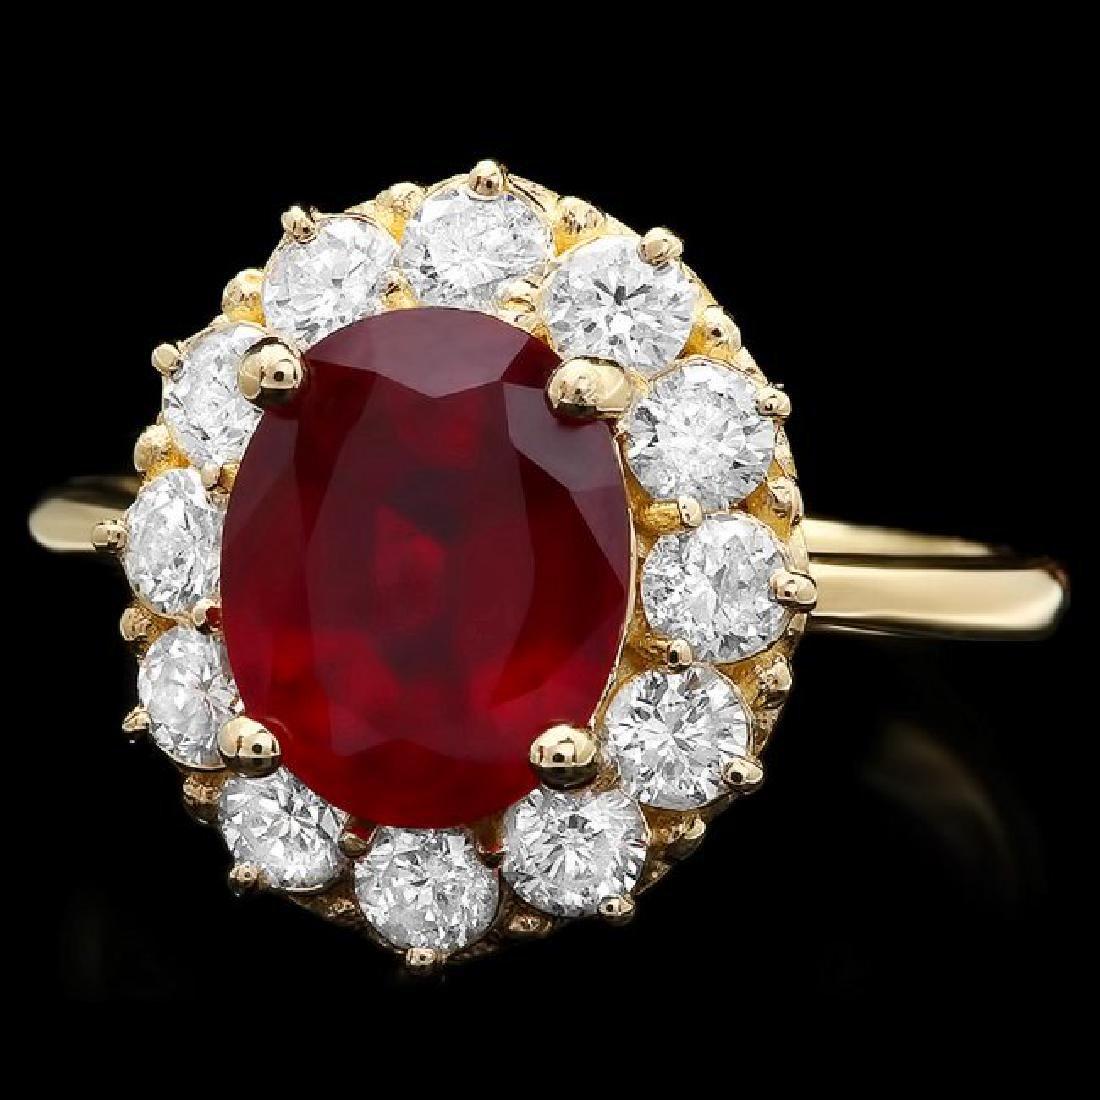 14k Yellow Gold 3.61ct Ruby 1.05ct Diamond Ring